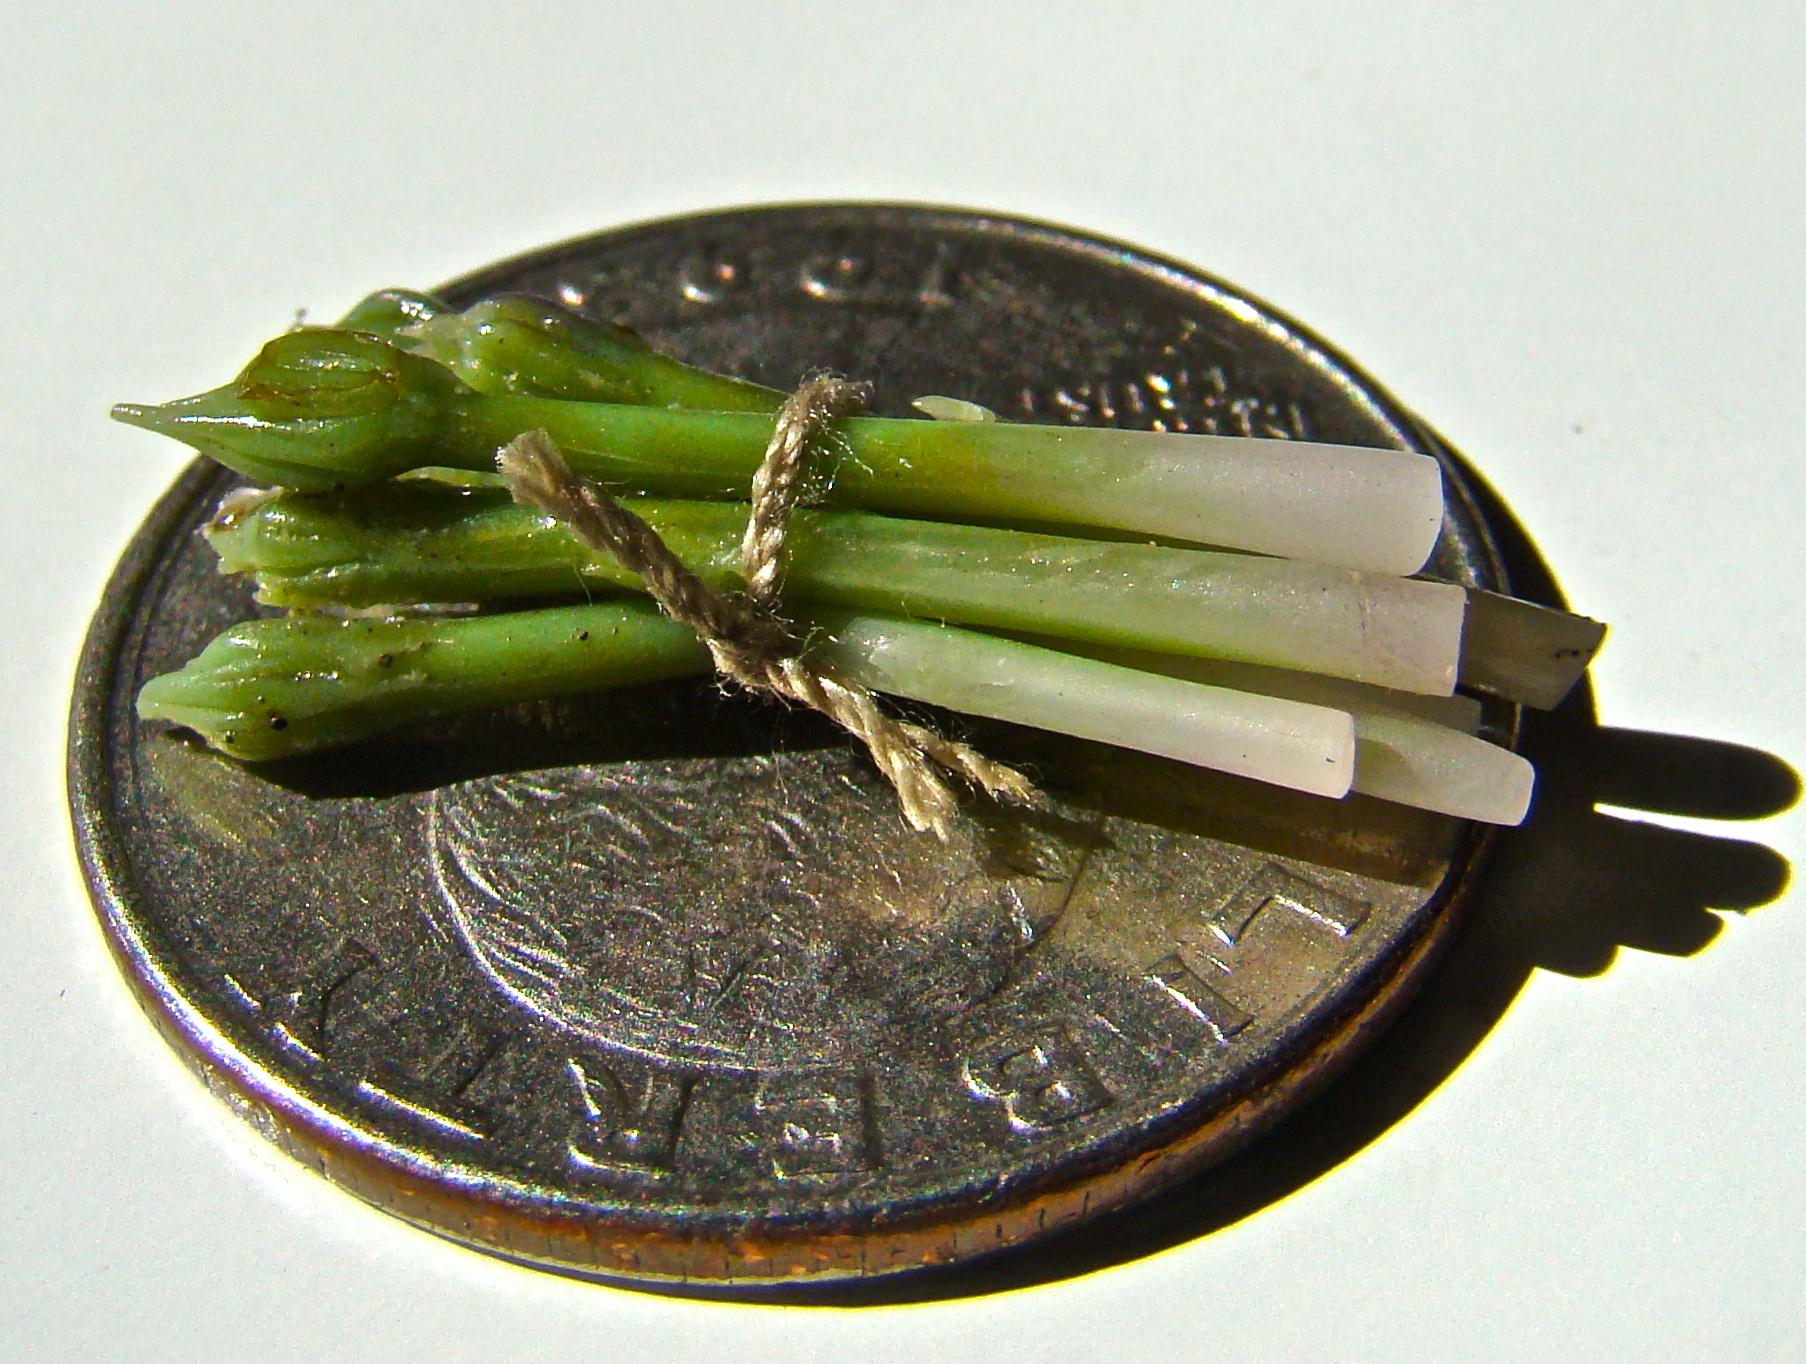 asparagusquarter.JPG